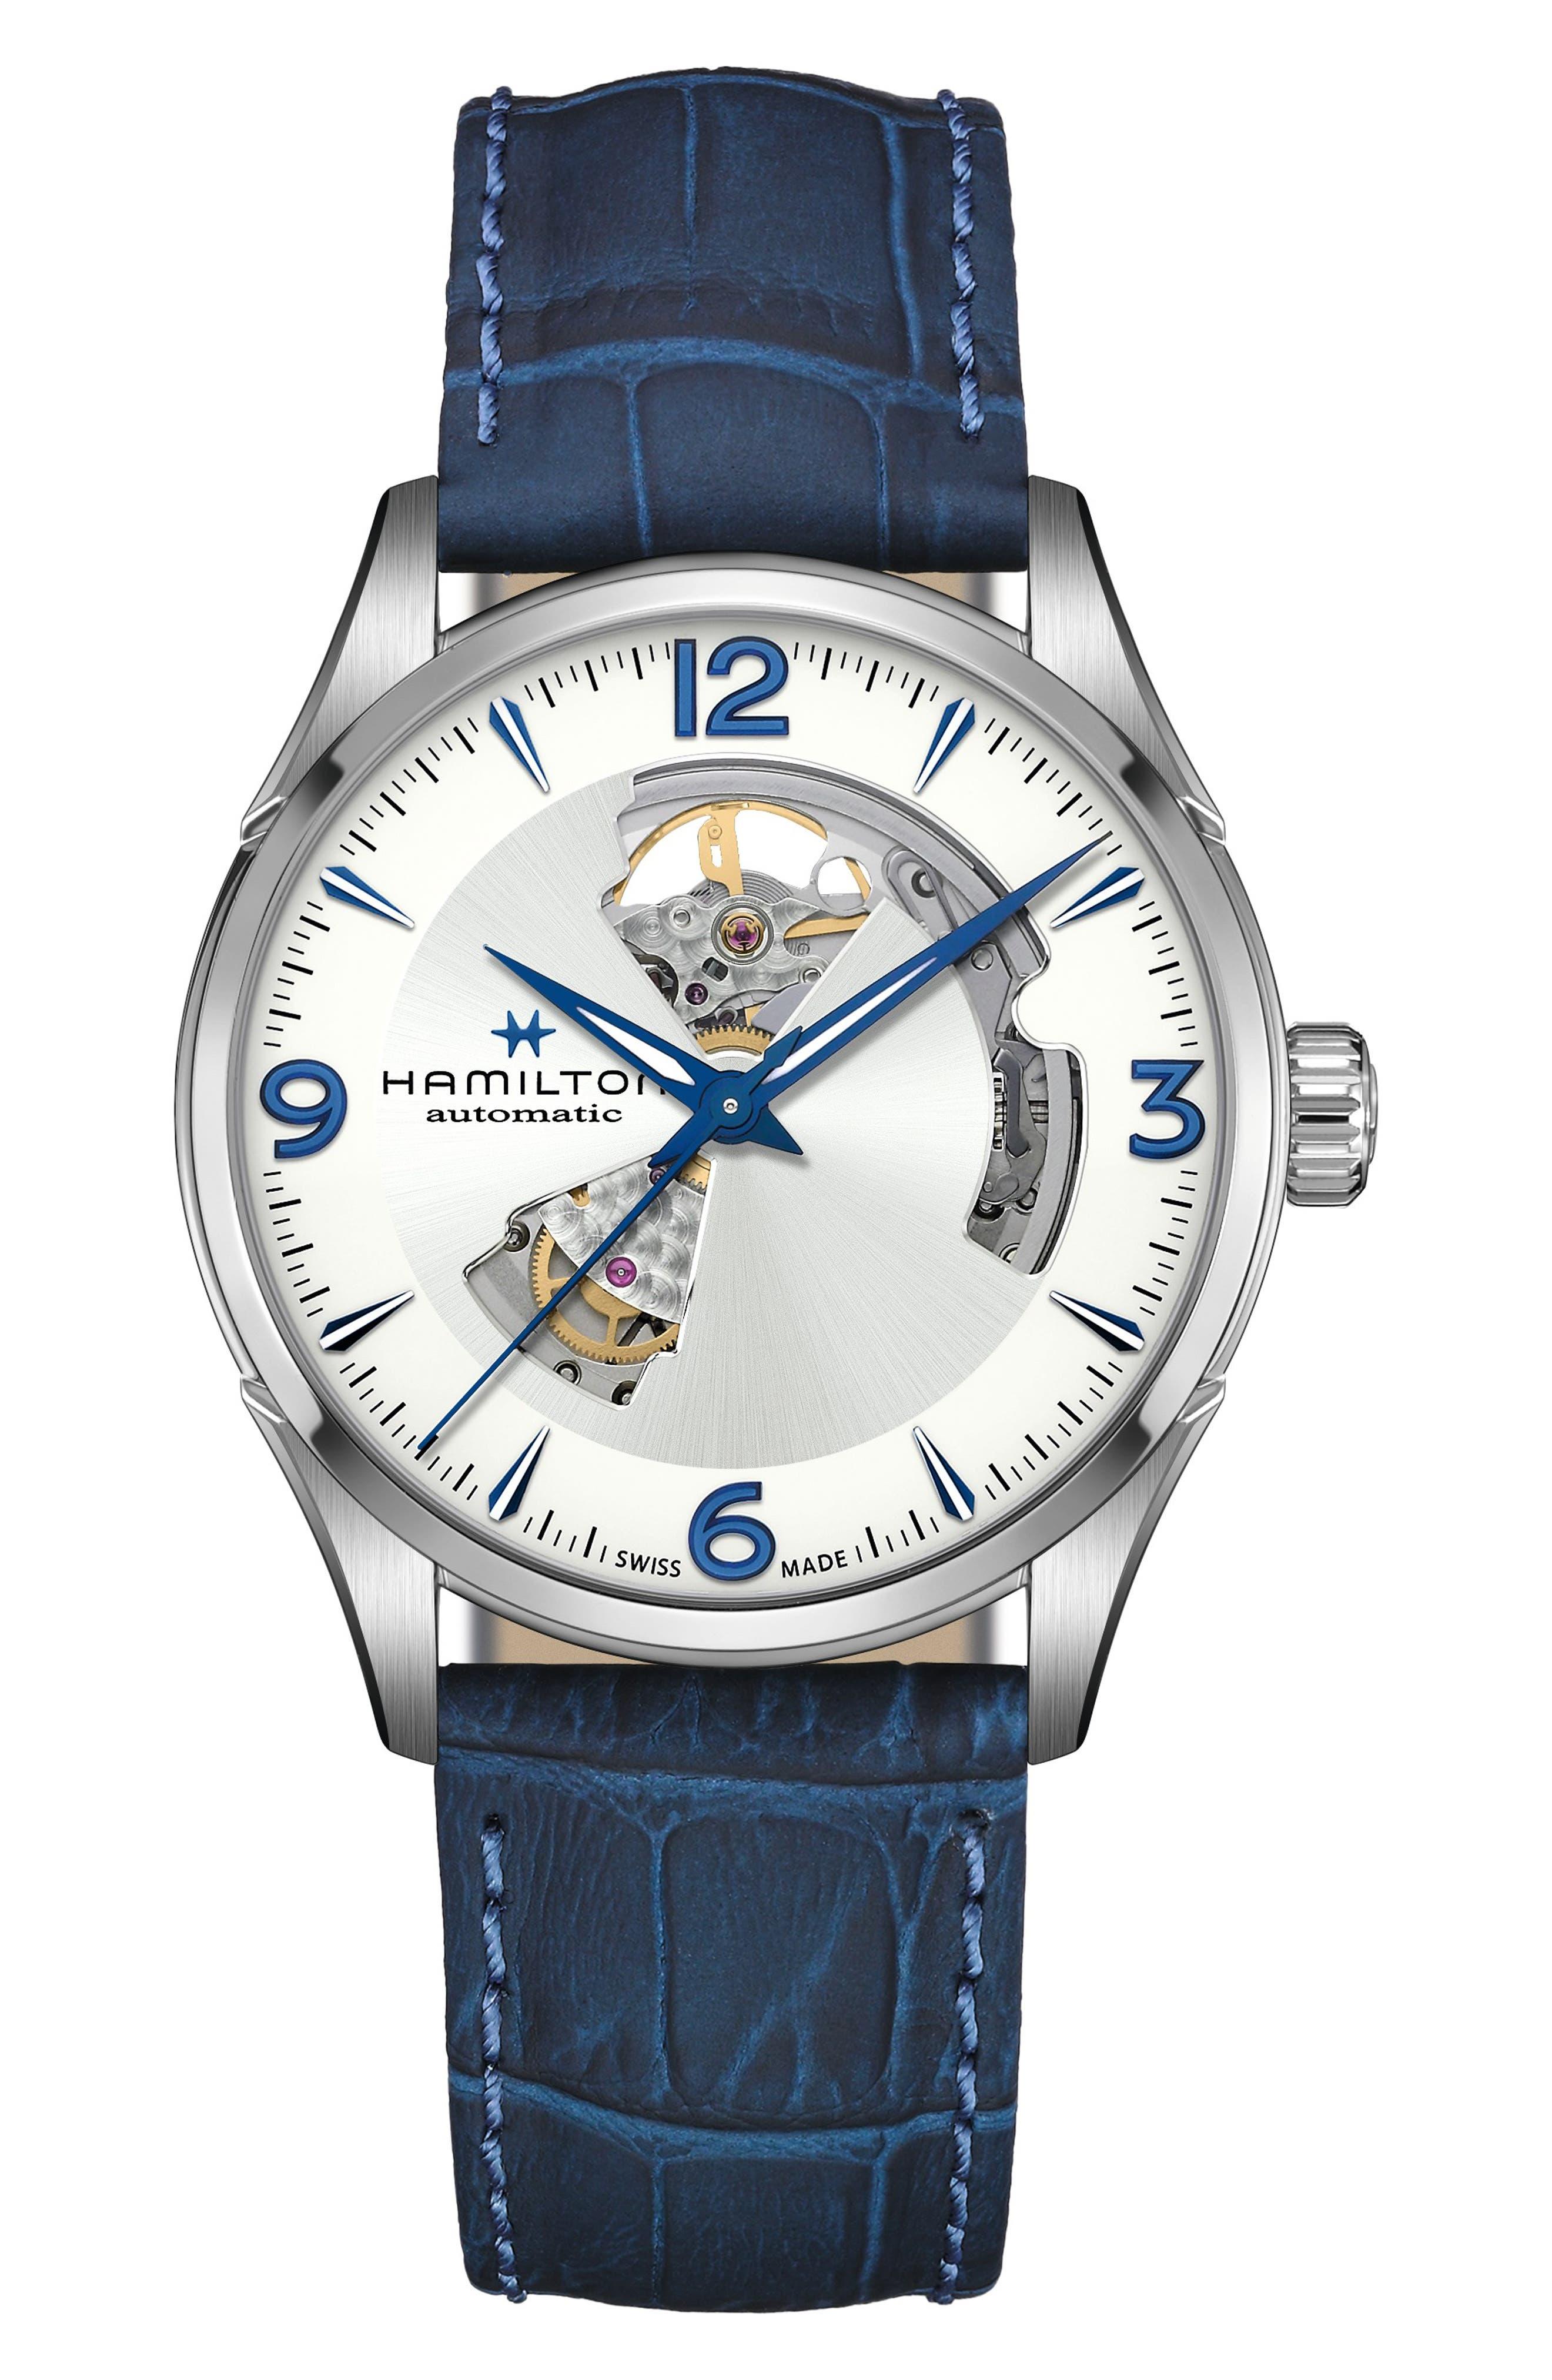 Jazzmaster Skeleton Leather Strap Watch